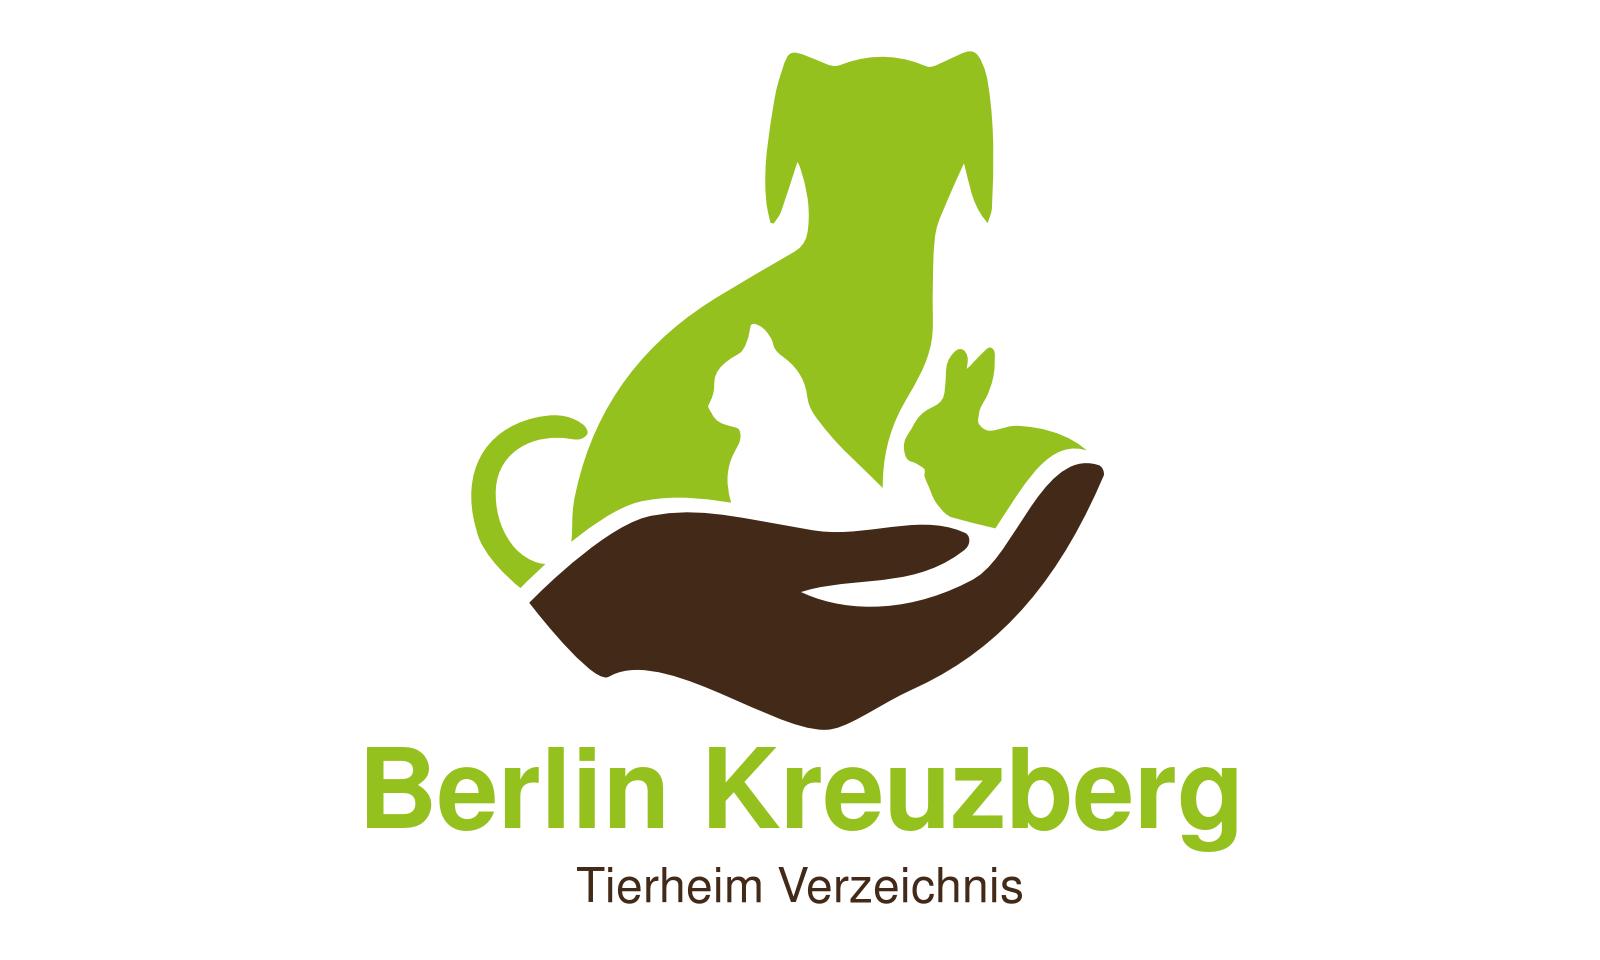 Tierheim Berlin Kreuzberg